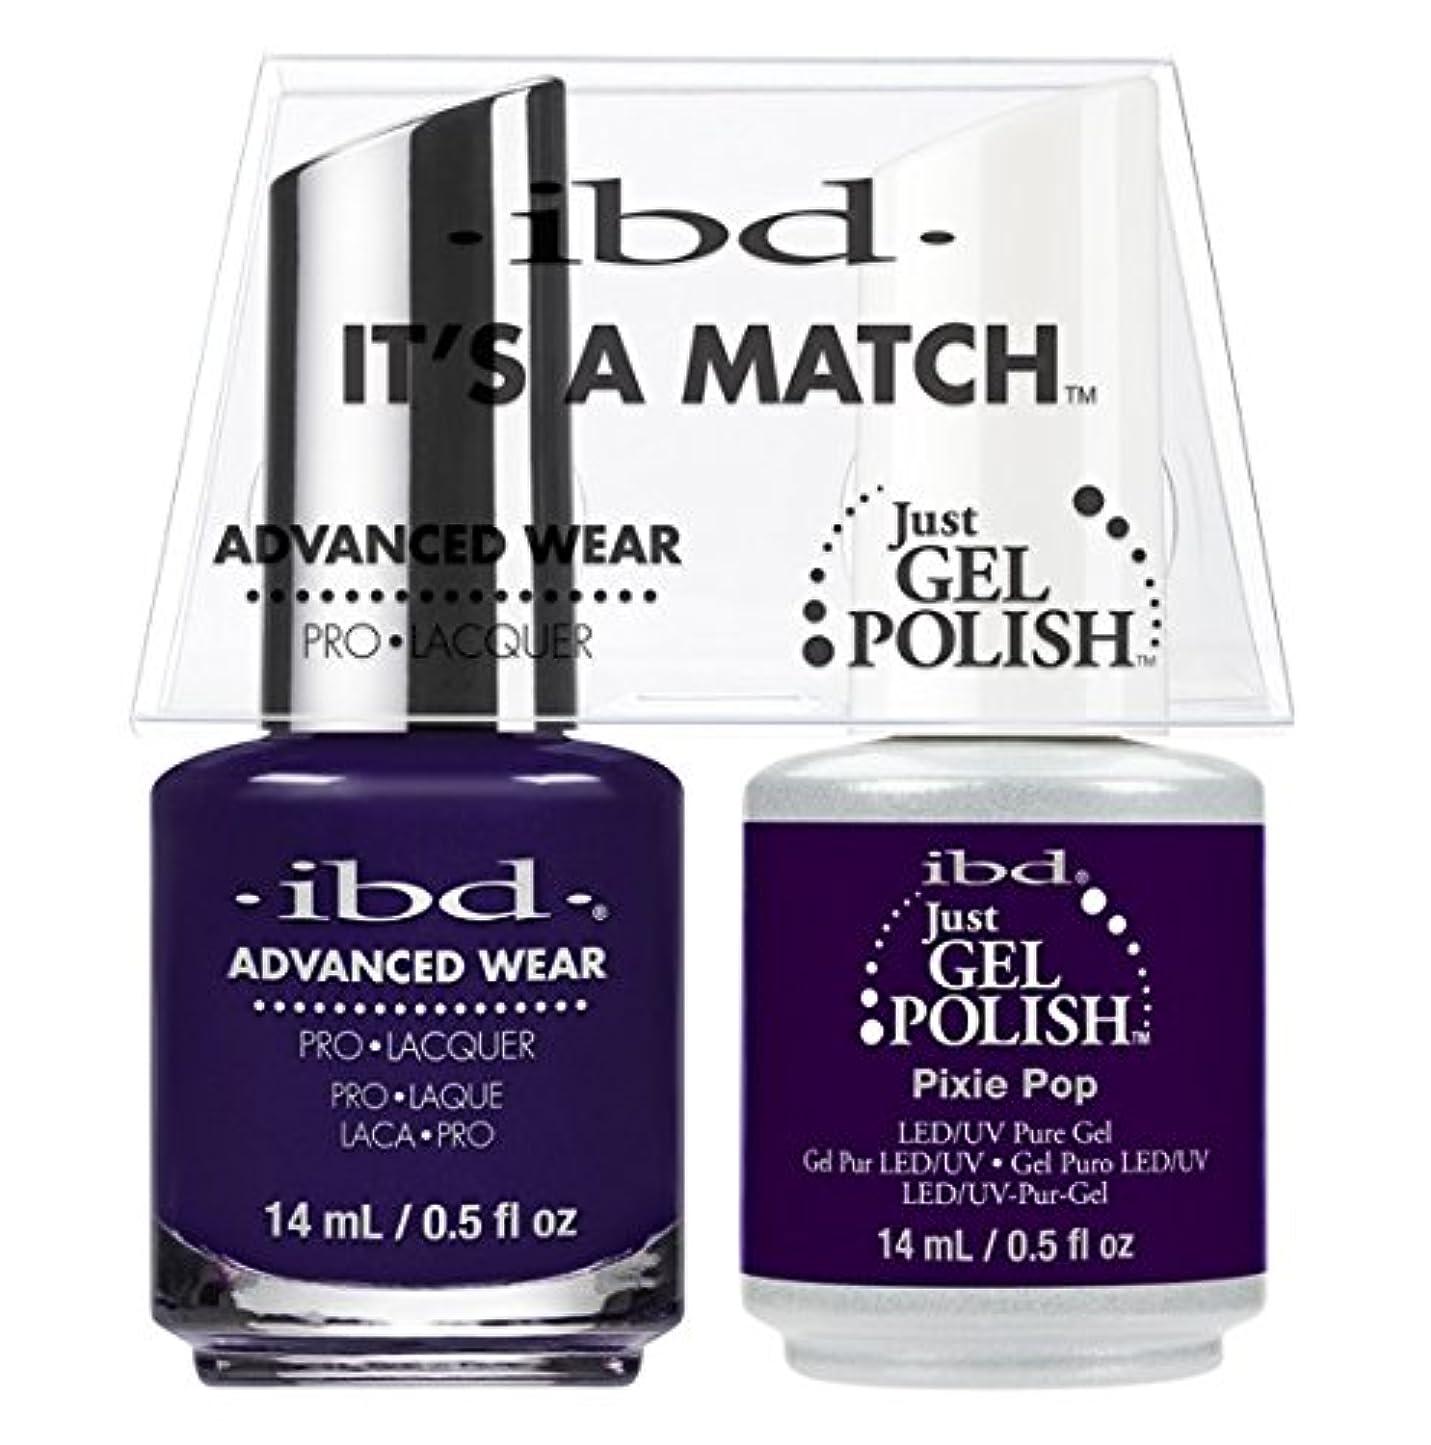 前置詞タッチ狂信者ibd - It's A Match -Duo Pack- Pixie Pop - 14 mL / 0.5 oz Each